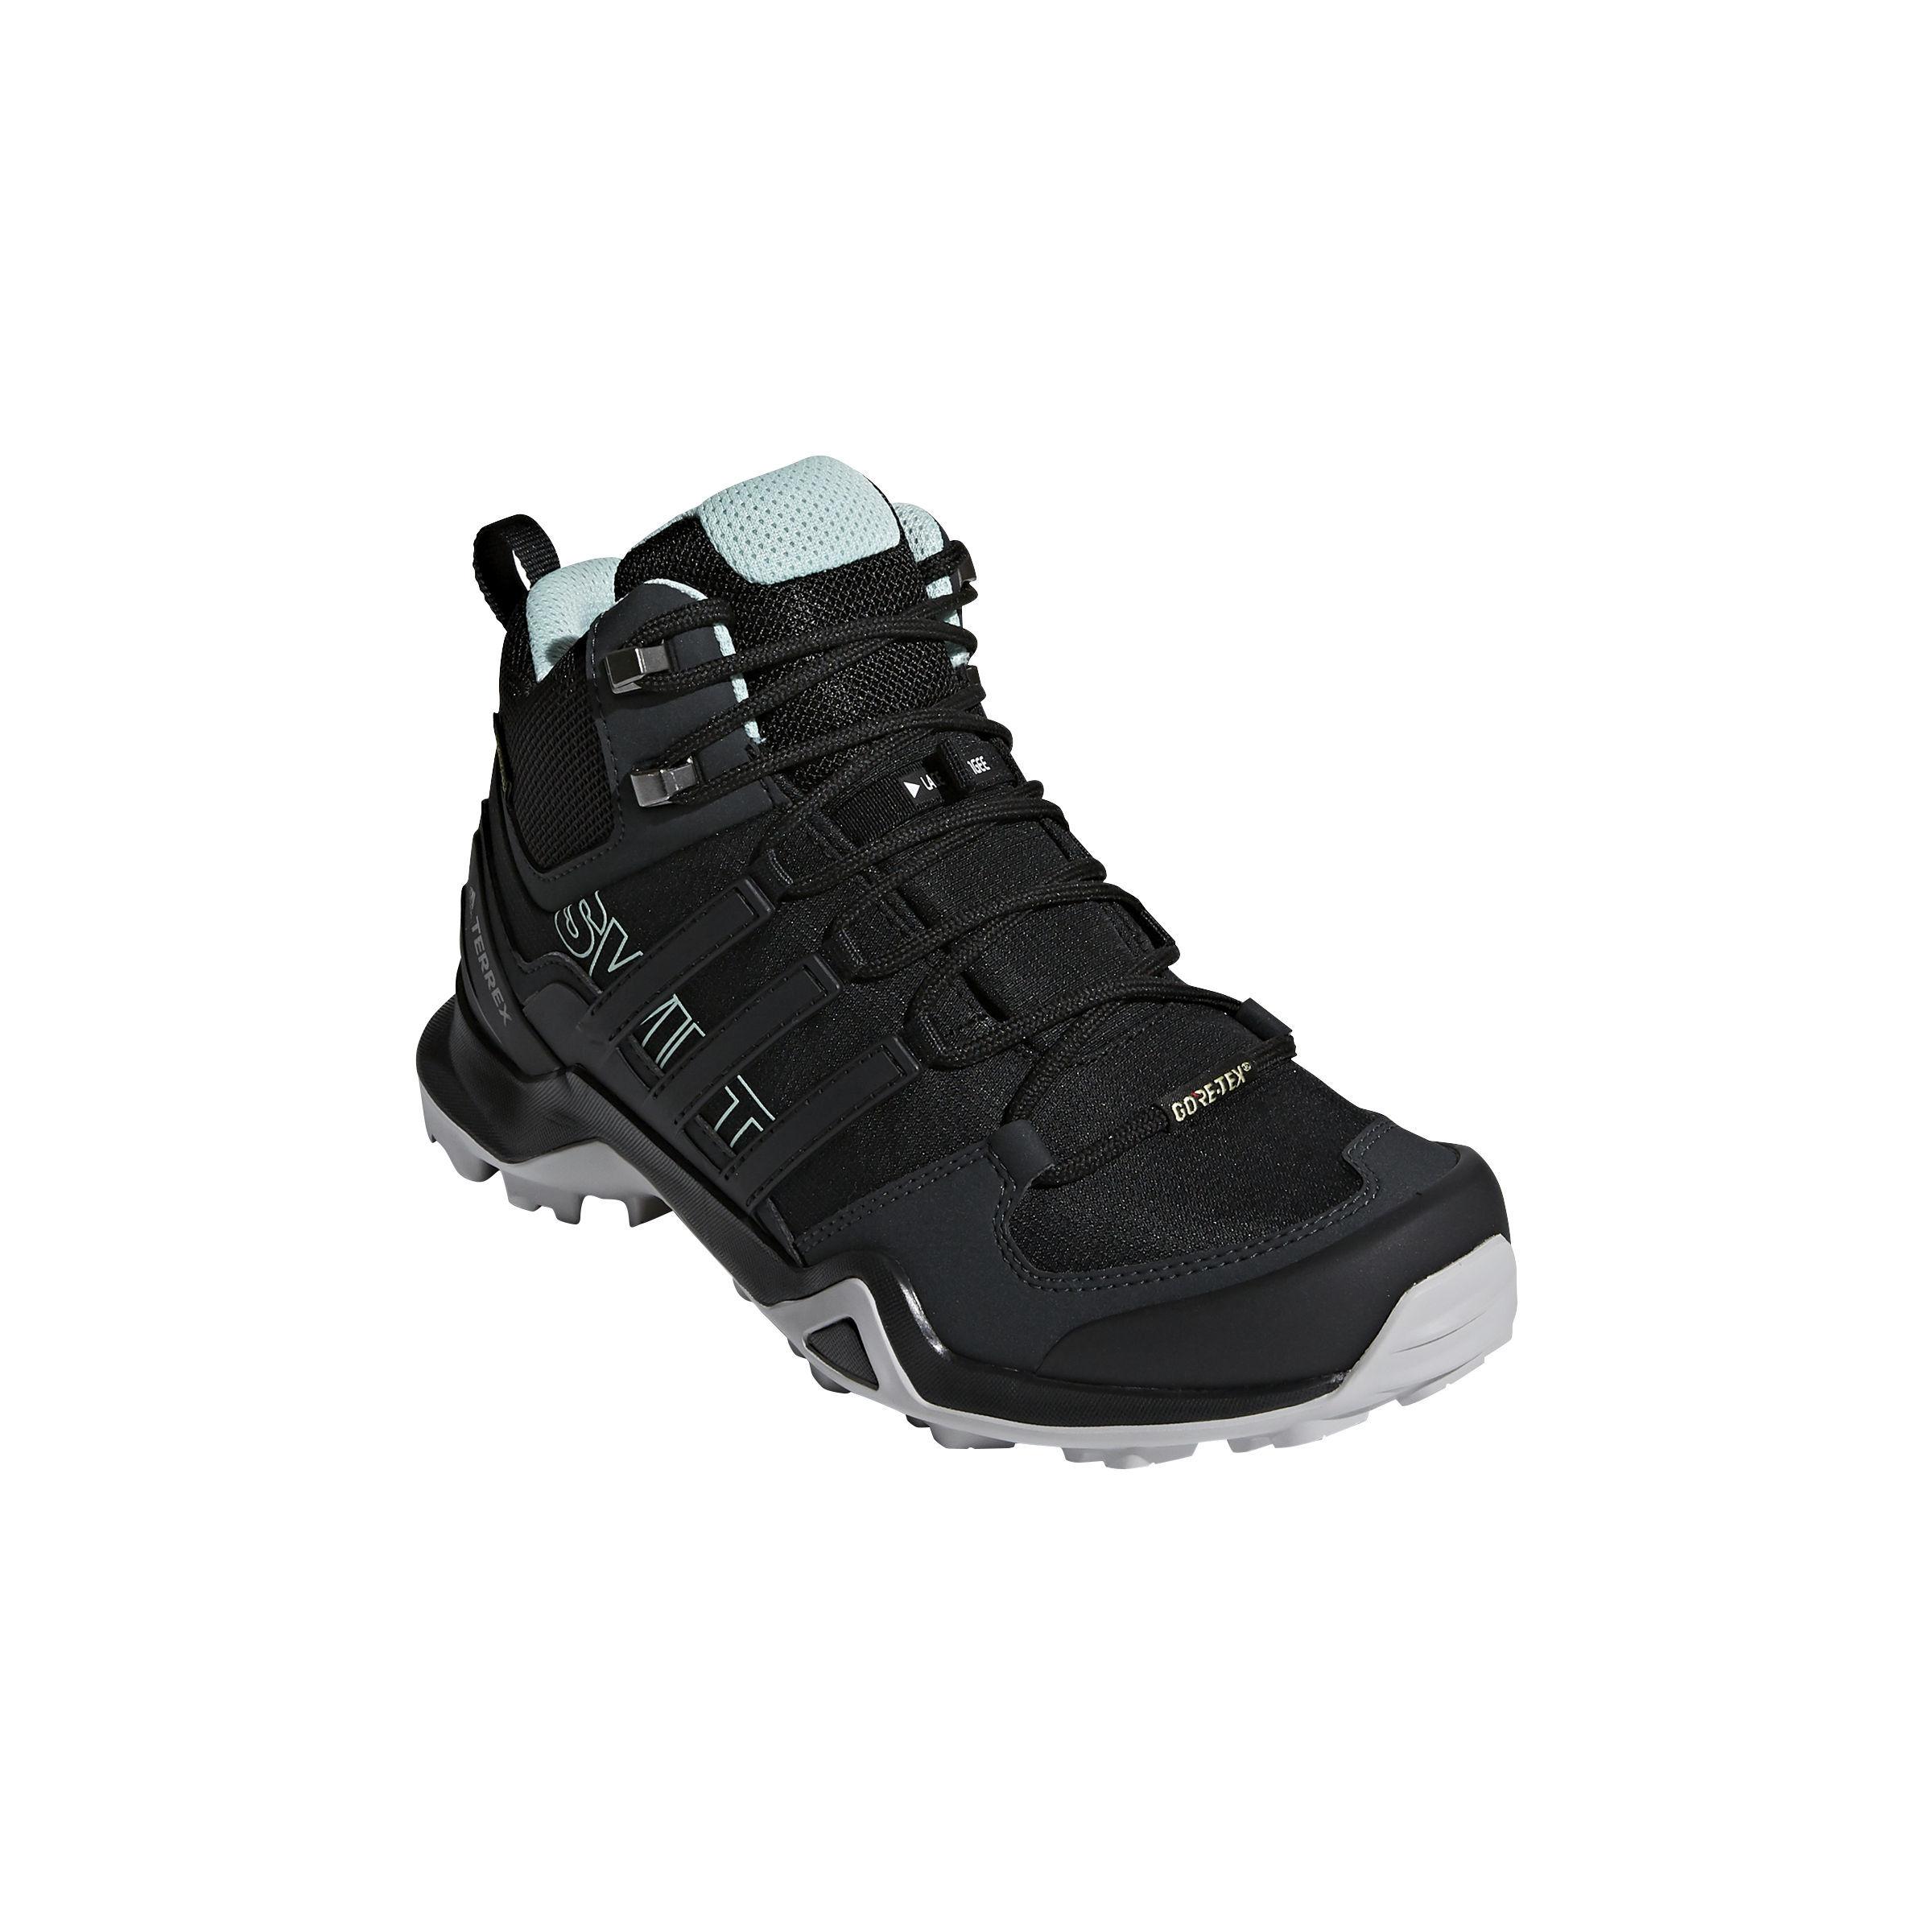 f75652cfcc6a0 Adidas Outdoor Terrex Swift R2 Mid GTX Hiking Shoes - Women s